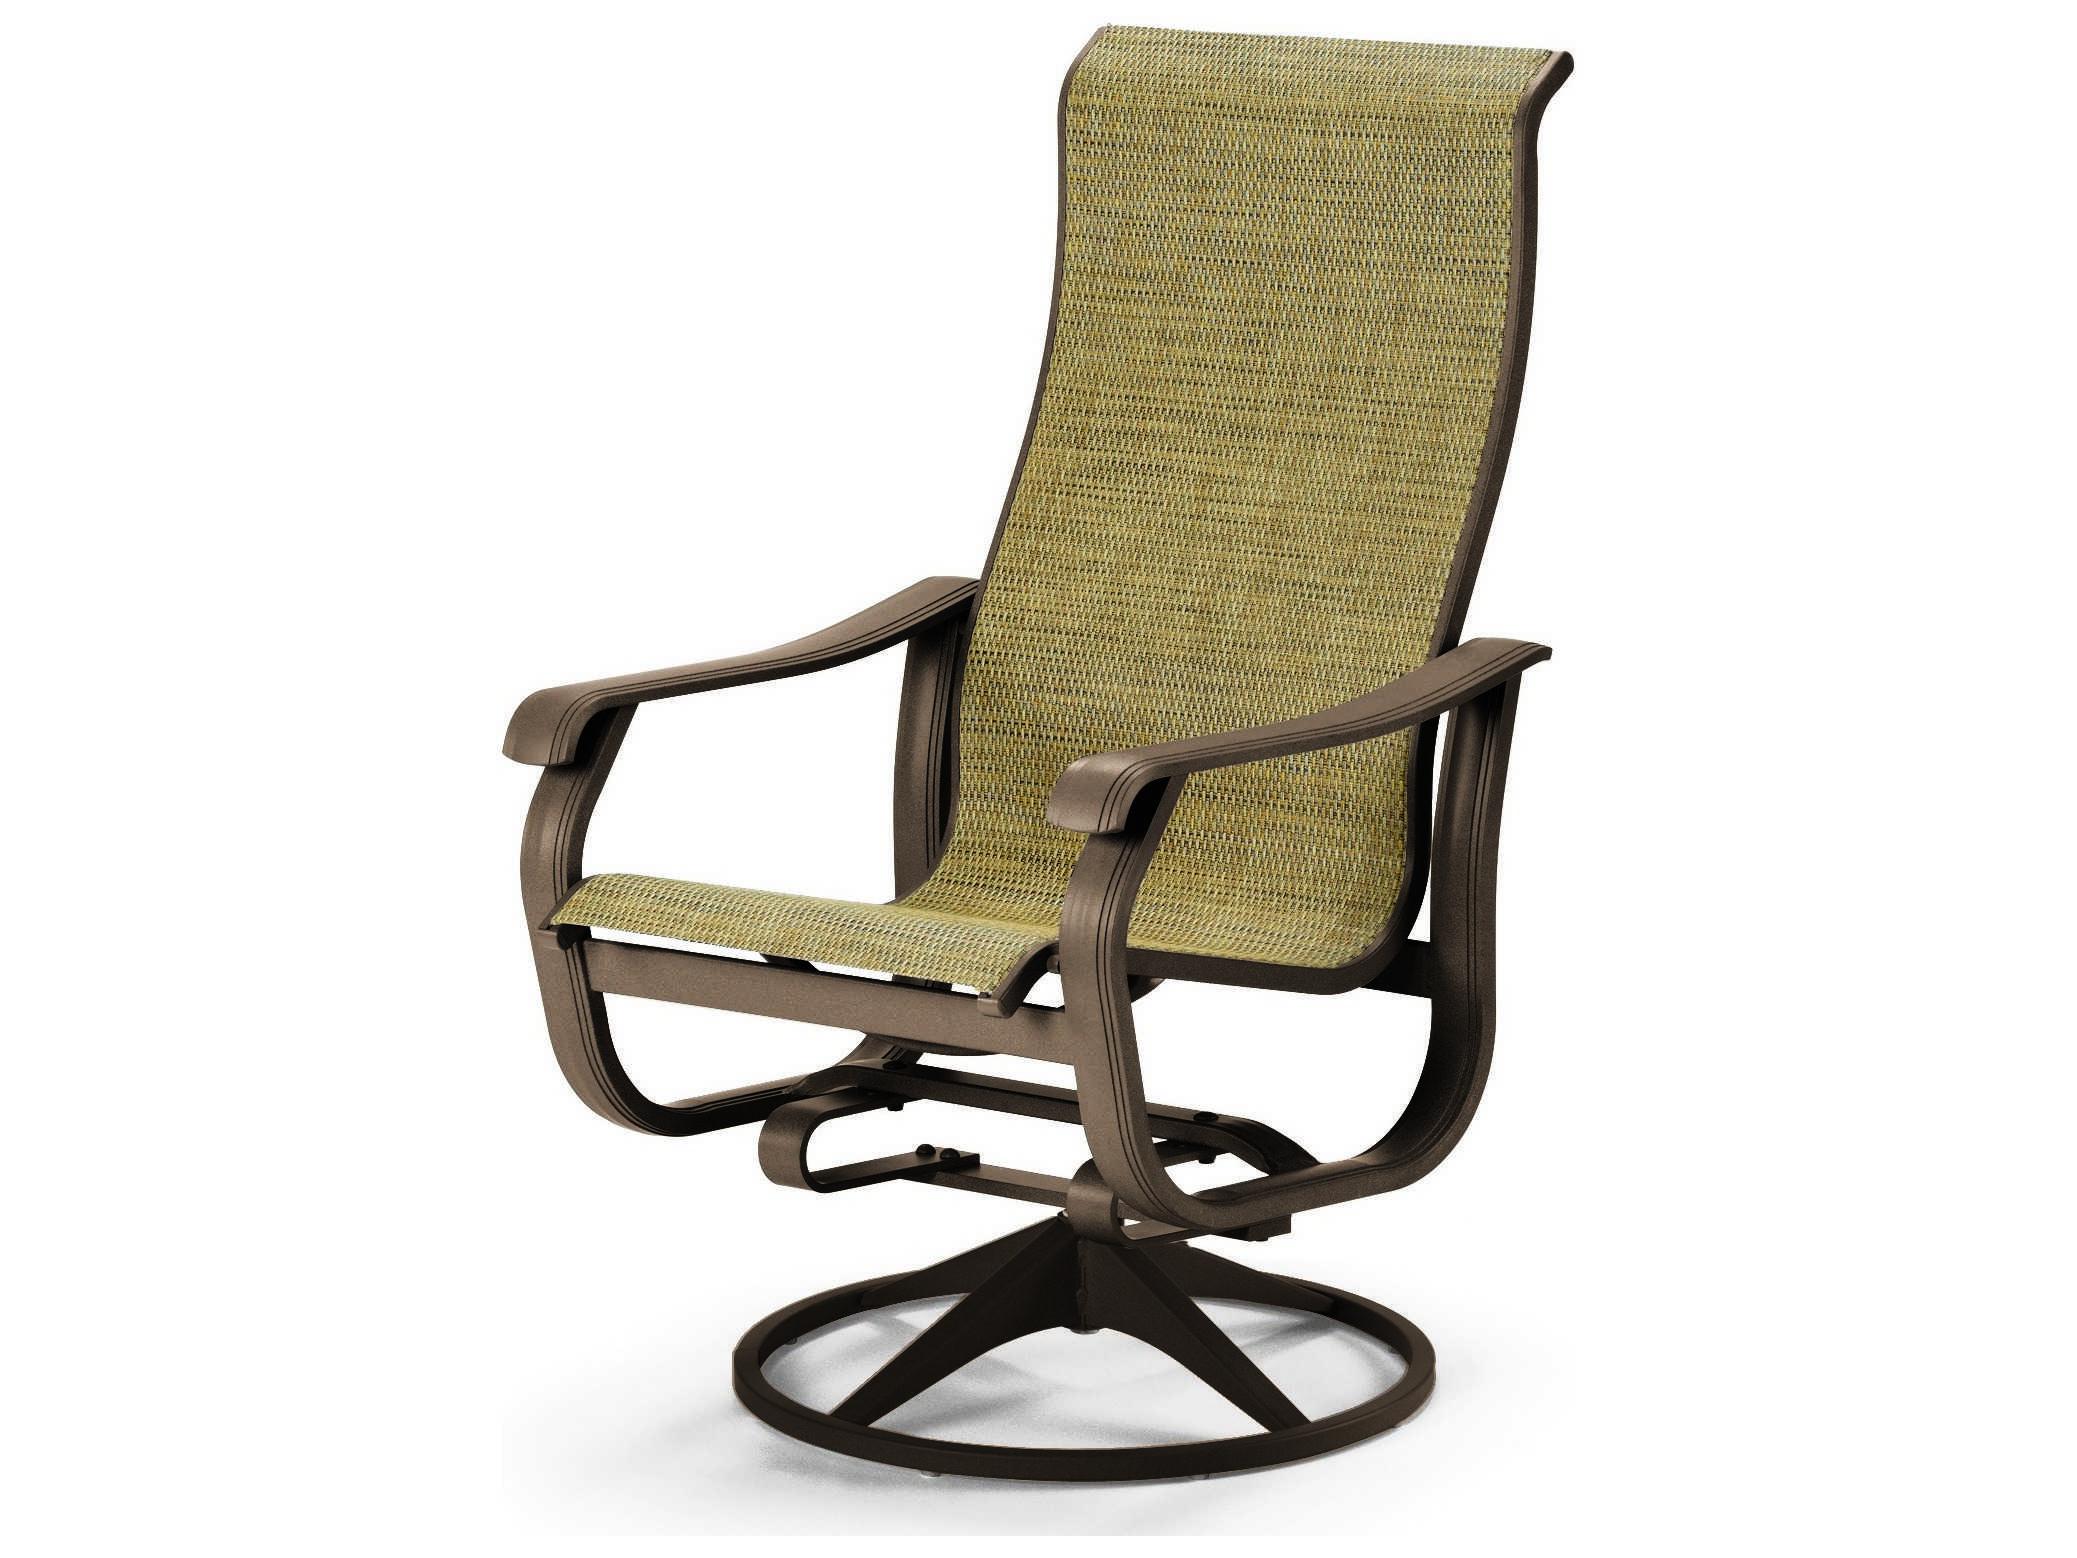 Telescope Casual Villa Sling Supreme Swivel Rocker Lounge Chair 5v50